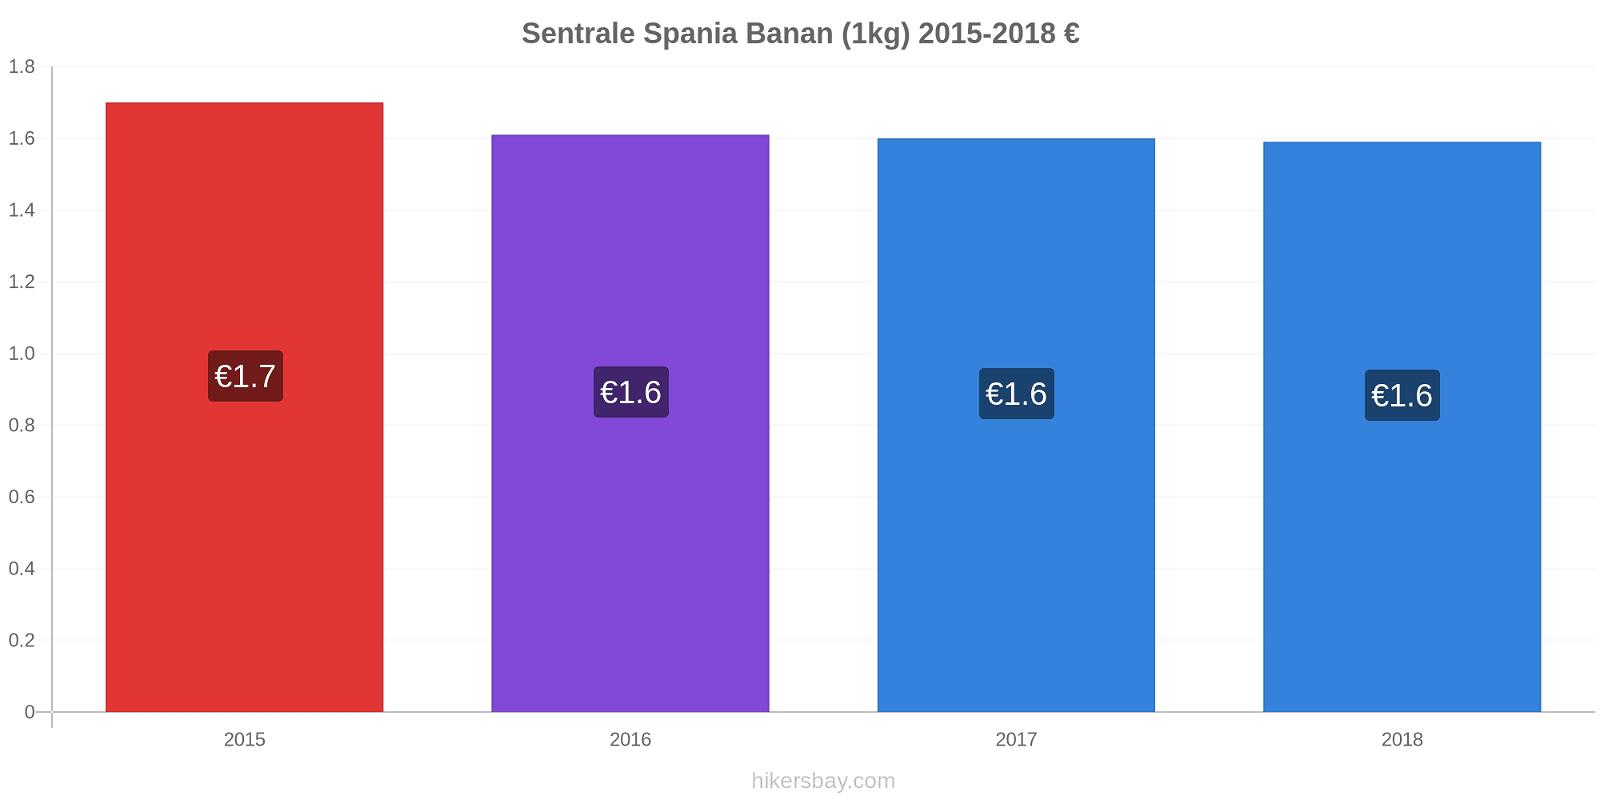 Sentrale Spania prisendringer Banan (1kg) hikersbay.com